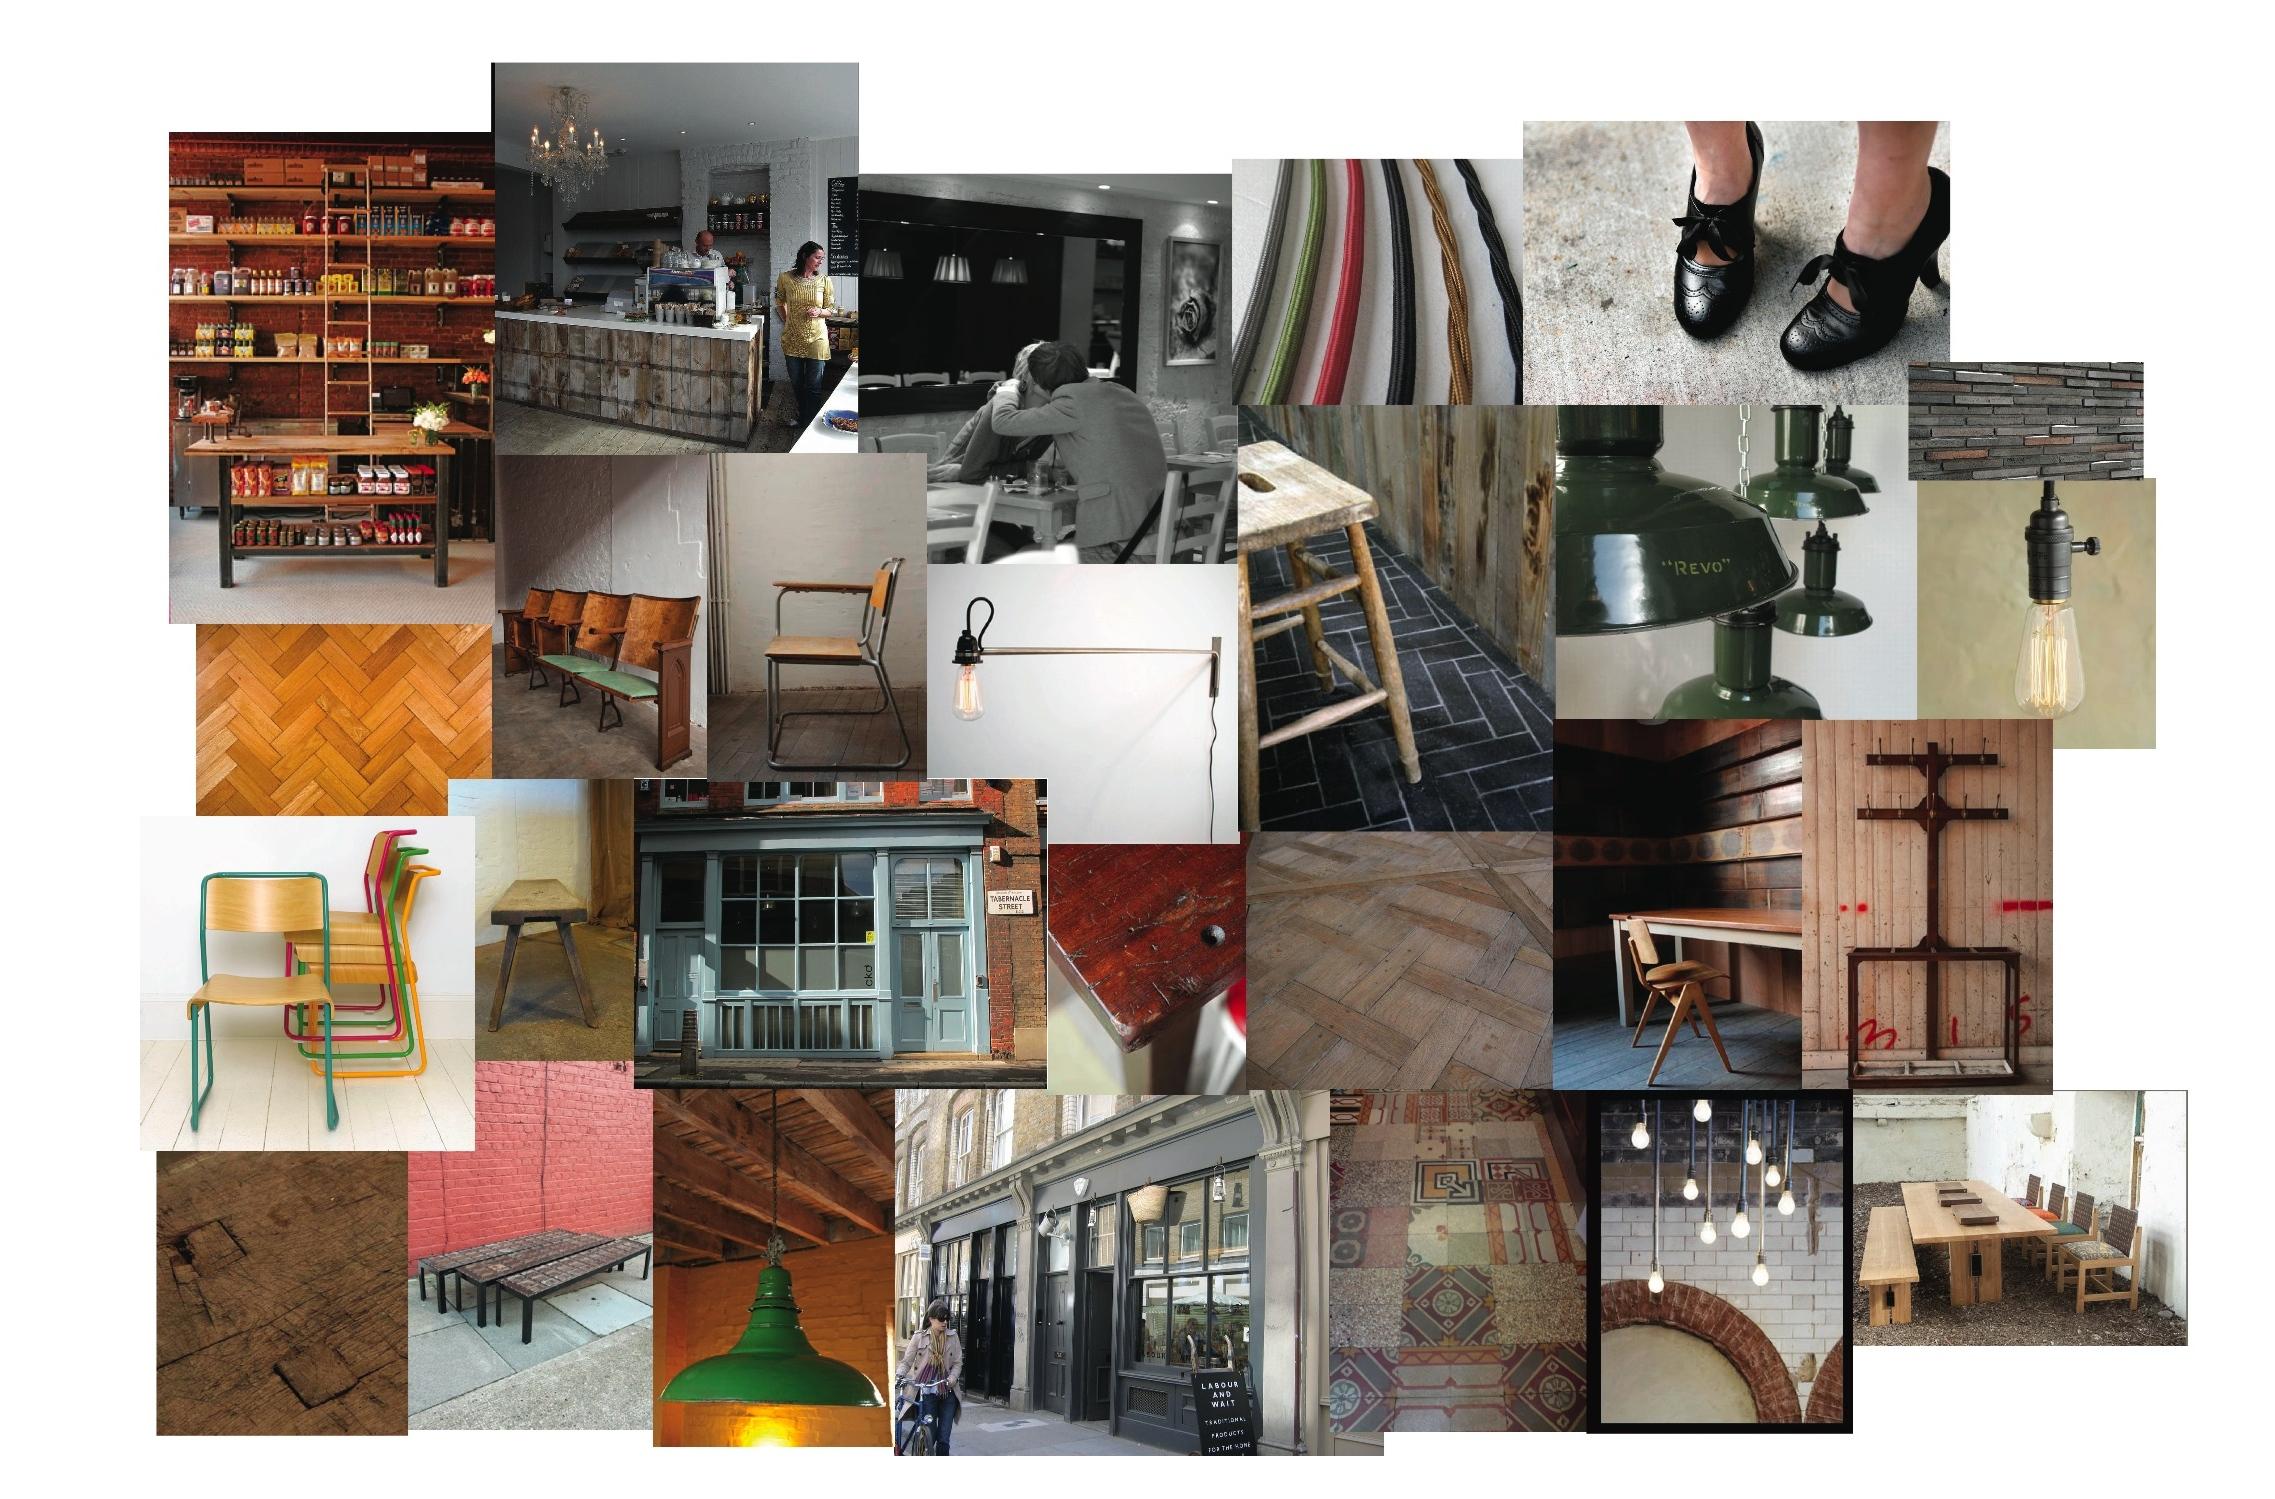 Coffee_Cafe_Interior_design_Montage.jpg